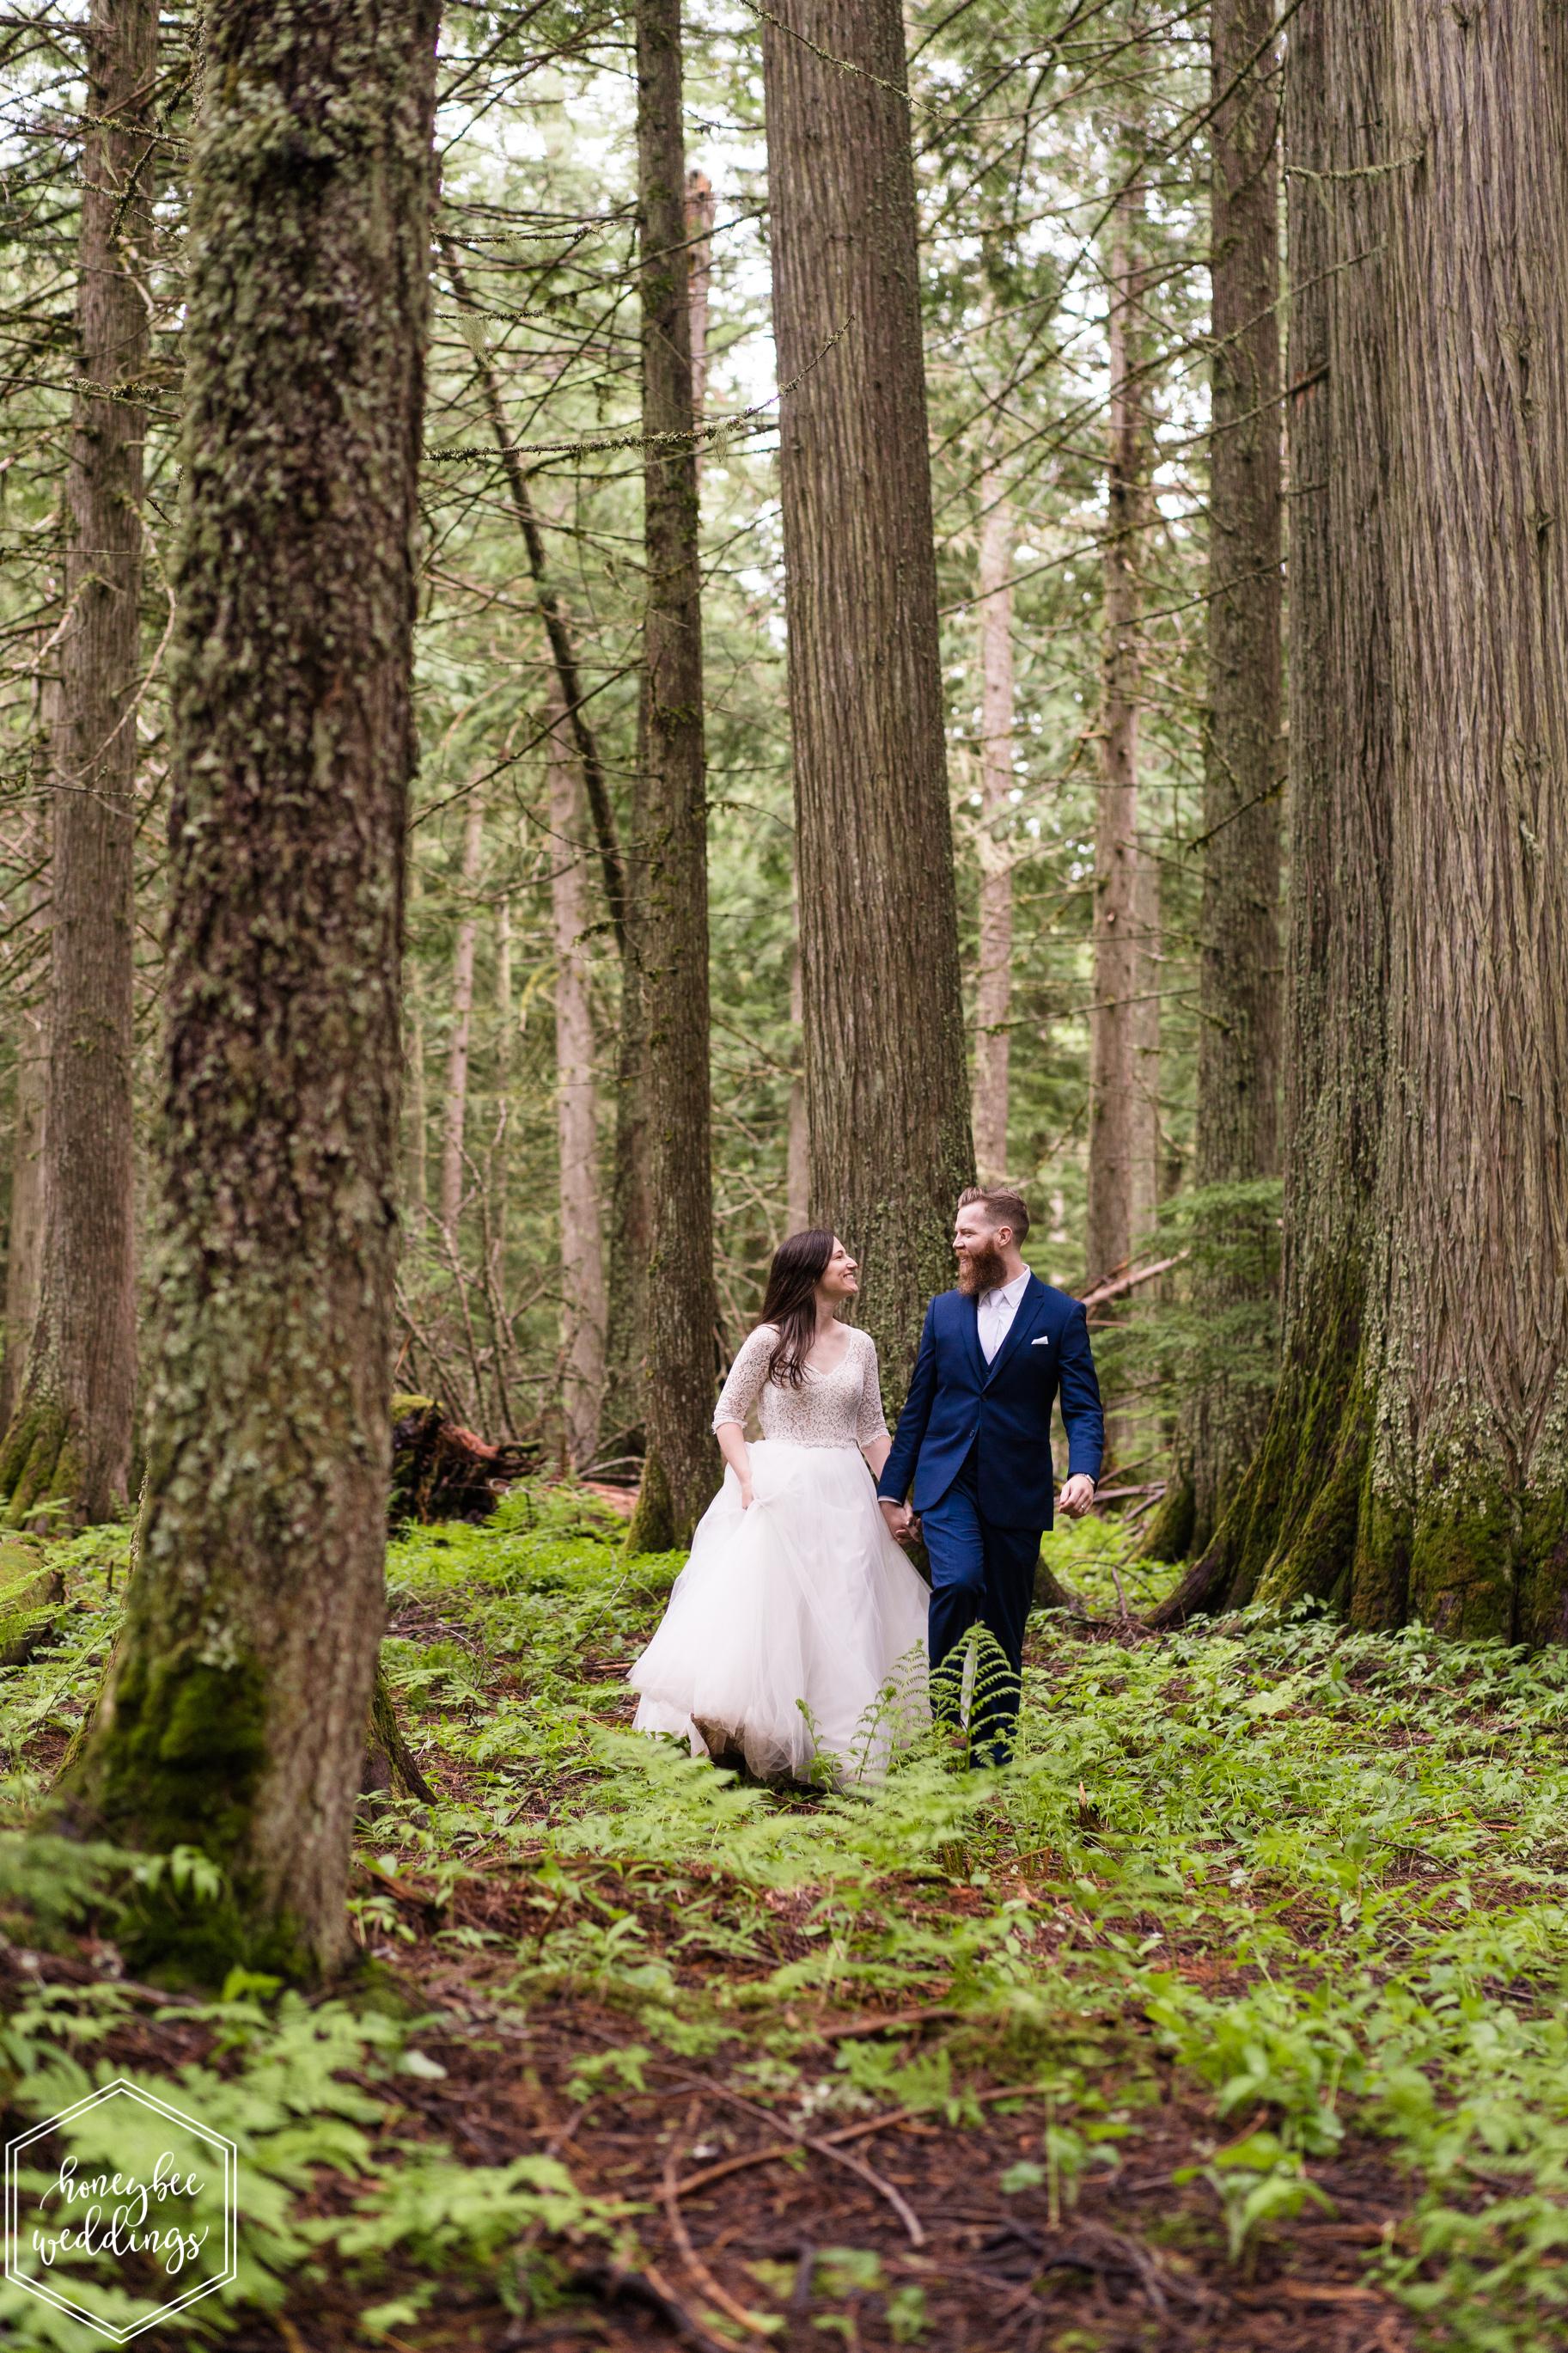 330Glacier National Park Wedding_Izaak Walton Inn Wedding_Honeybee Weddings_Norah & Kyle_June 09, 2019-227.jpg